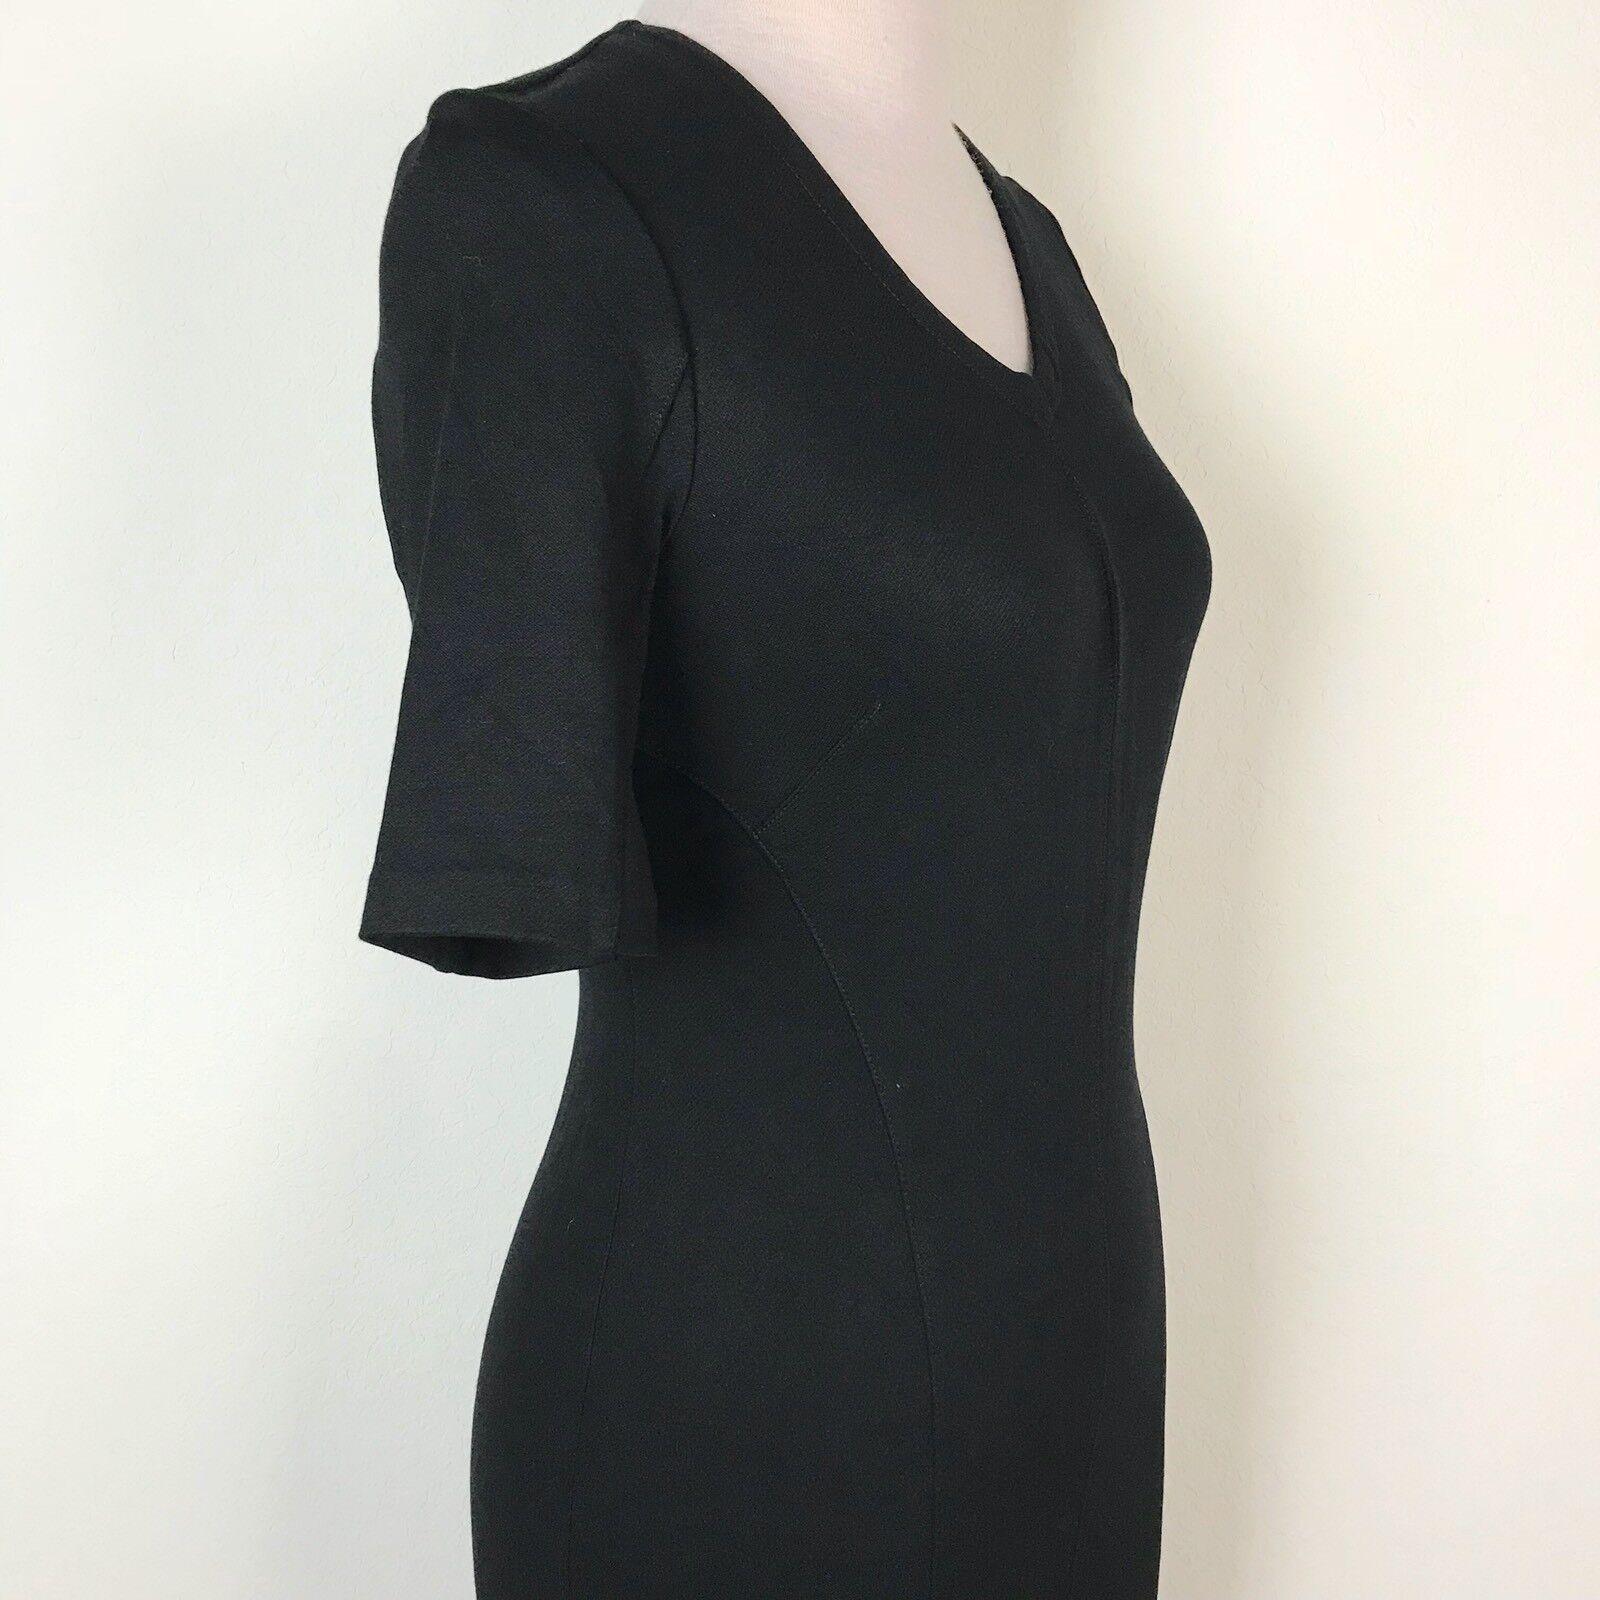 Cabi Claire Black Dress Career Evening LBD #3101 … - image 5